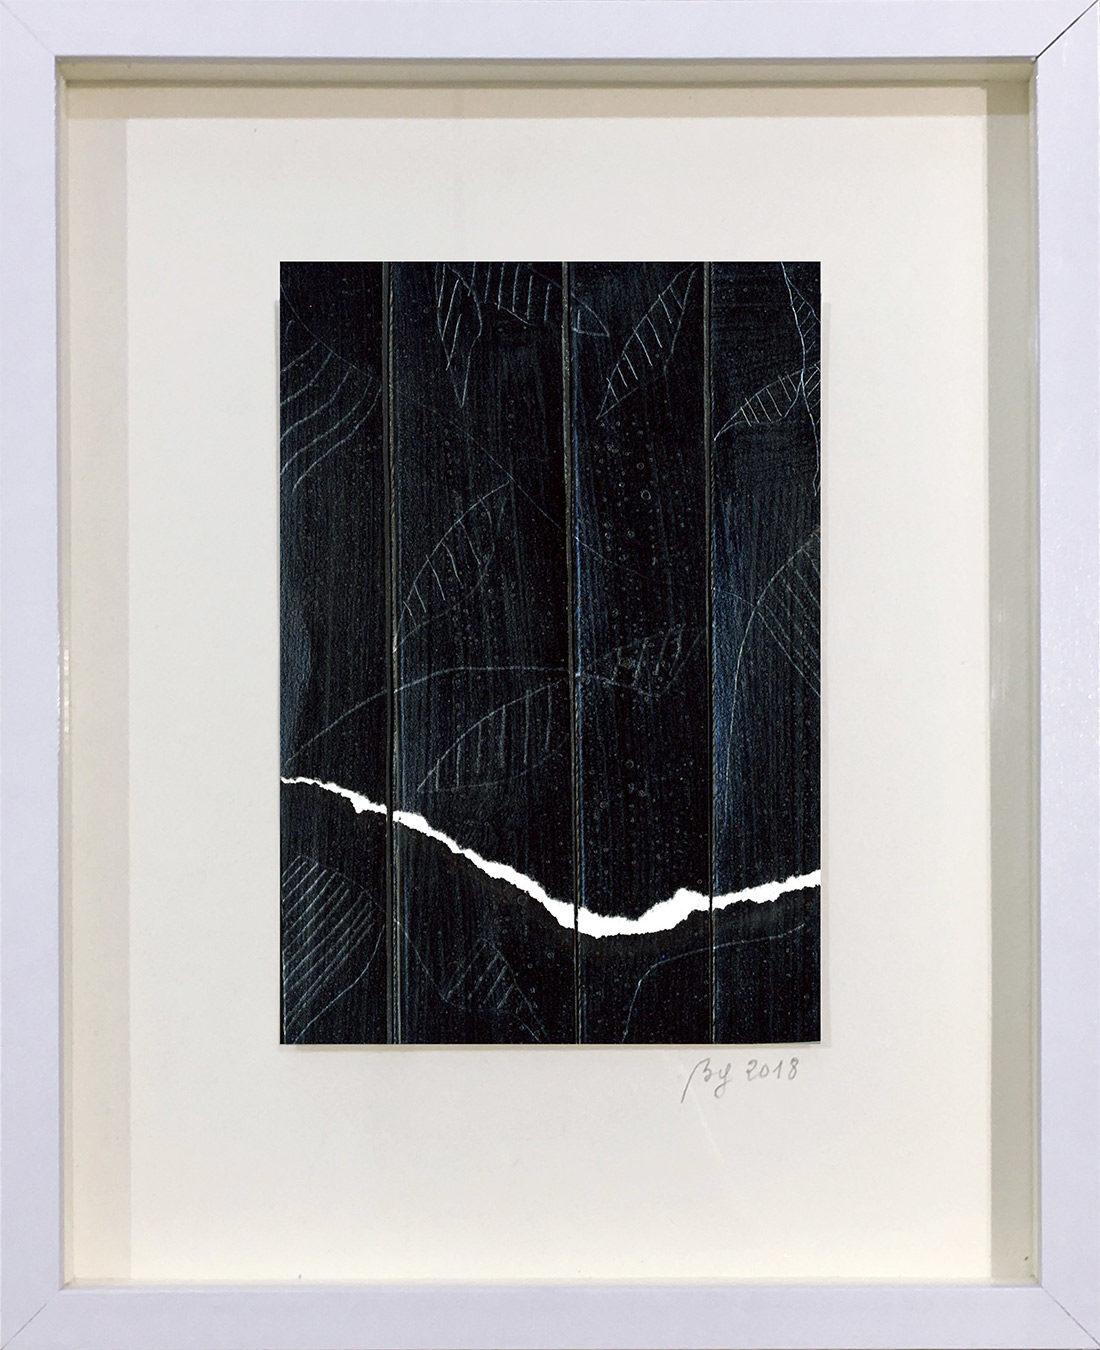 Bernard Gortais - Oeuvre sur papier - Continuum 141